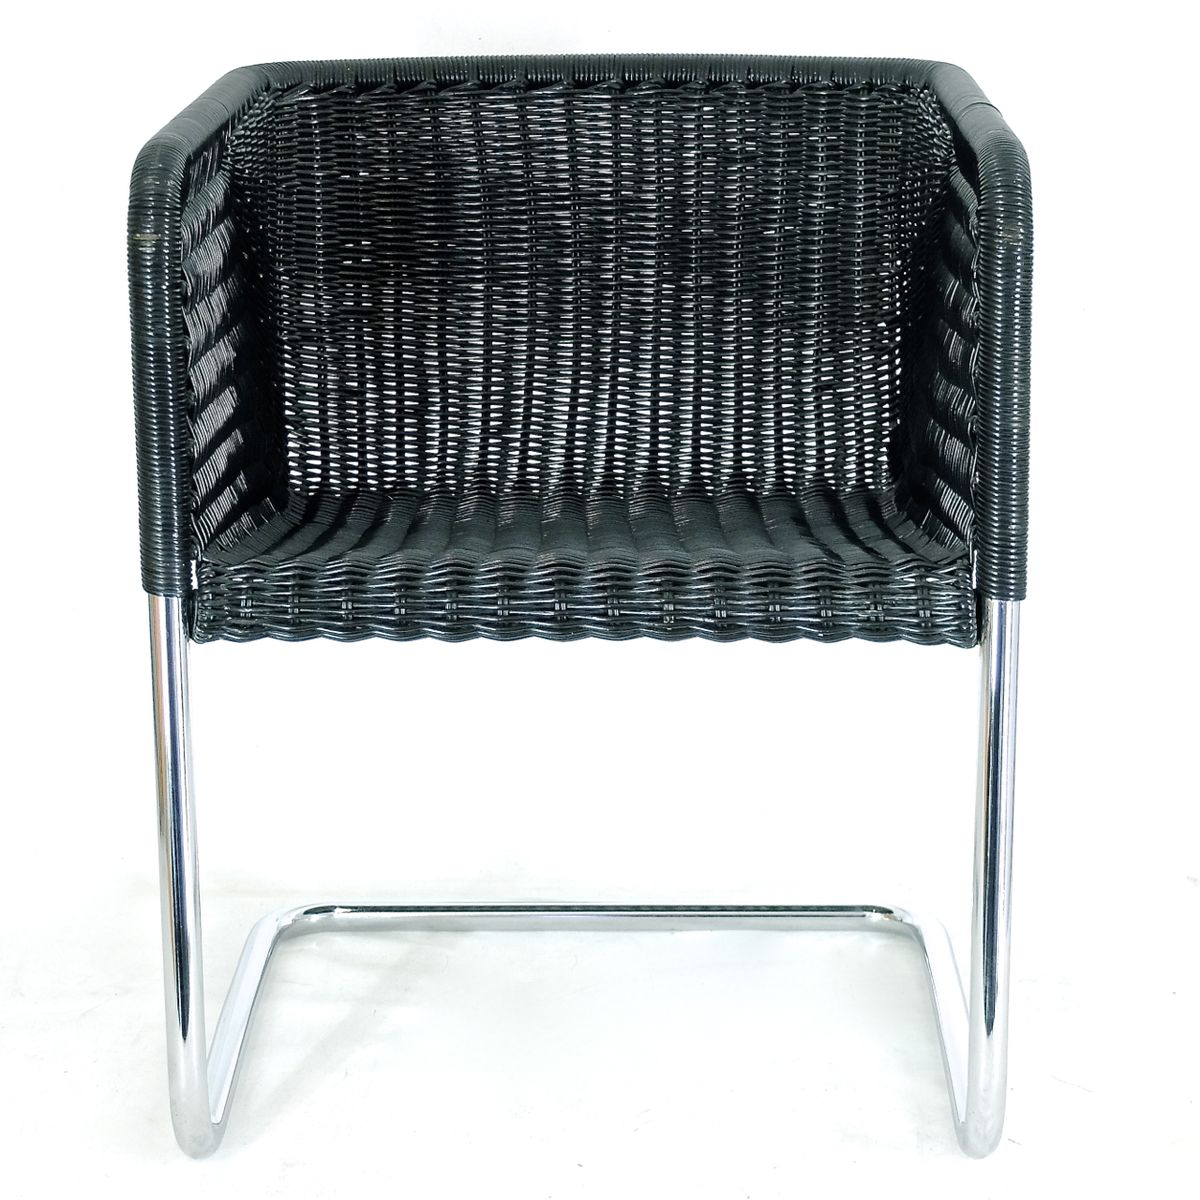 modell d43 freischwinger stuhl im bauhaus stil 4er set bei pamono kaufen. Black Bedroom Furniture Sets. Home Design Ideas